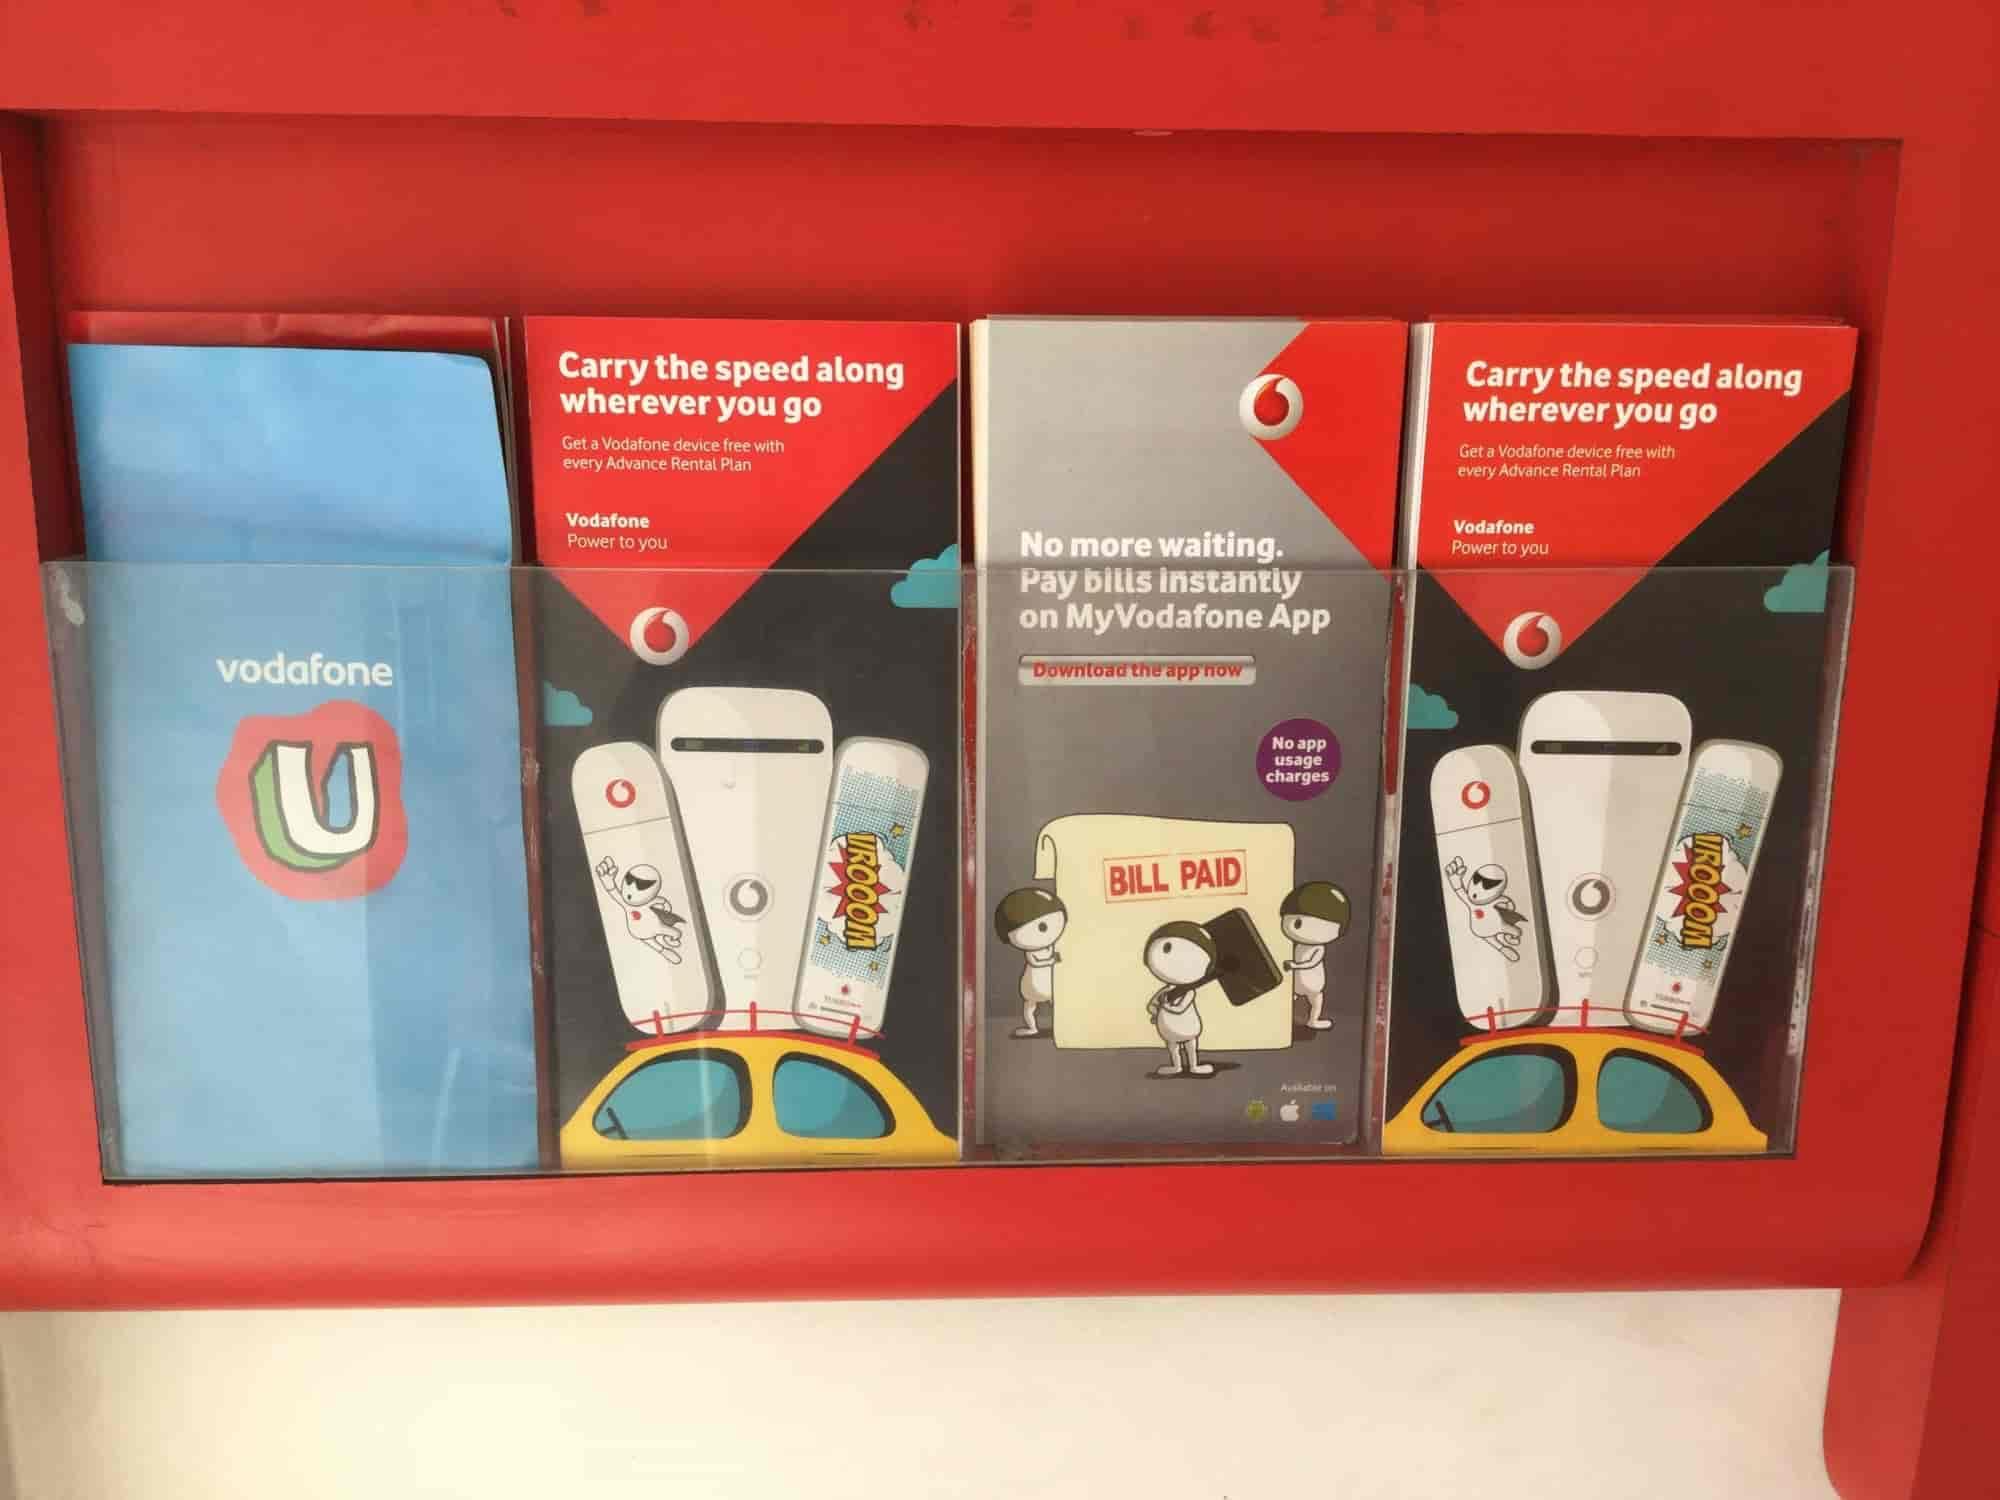 Vodafone Mini Store, Pimple Saudagar - Mobile Phone Service